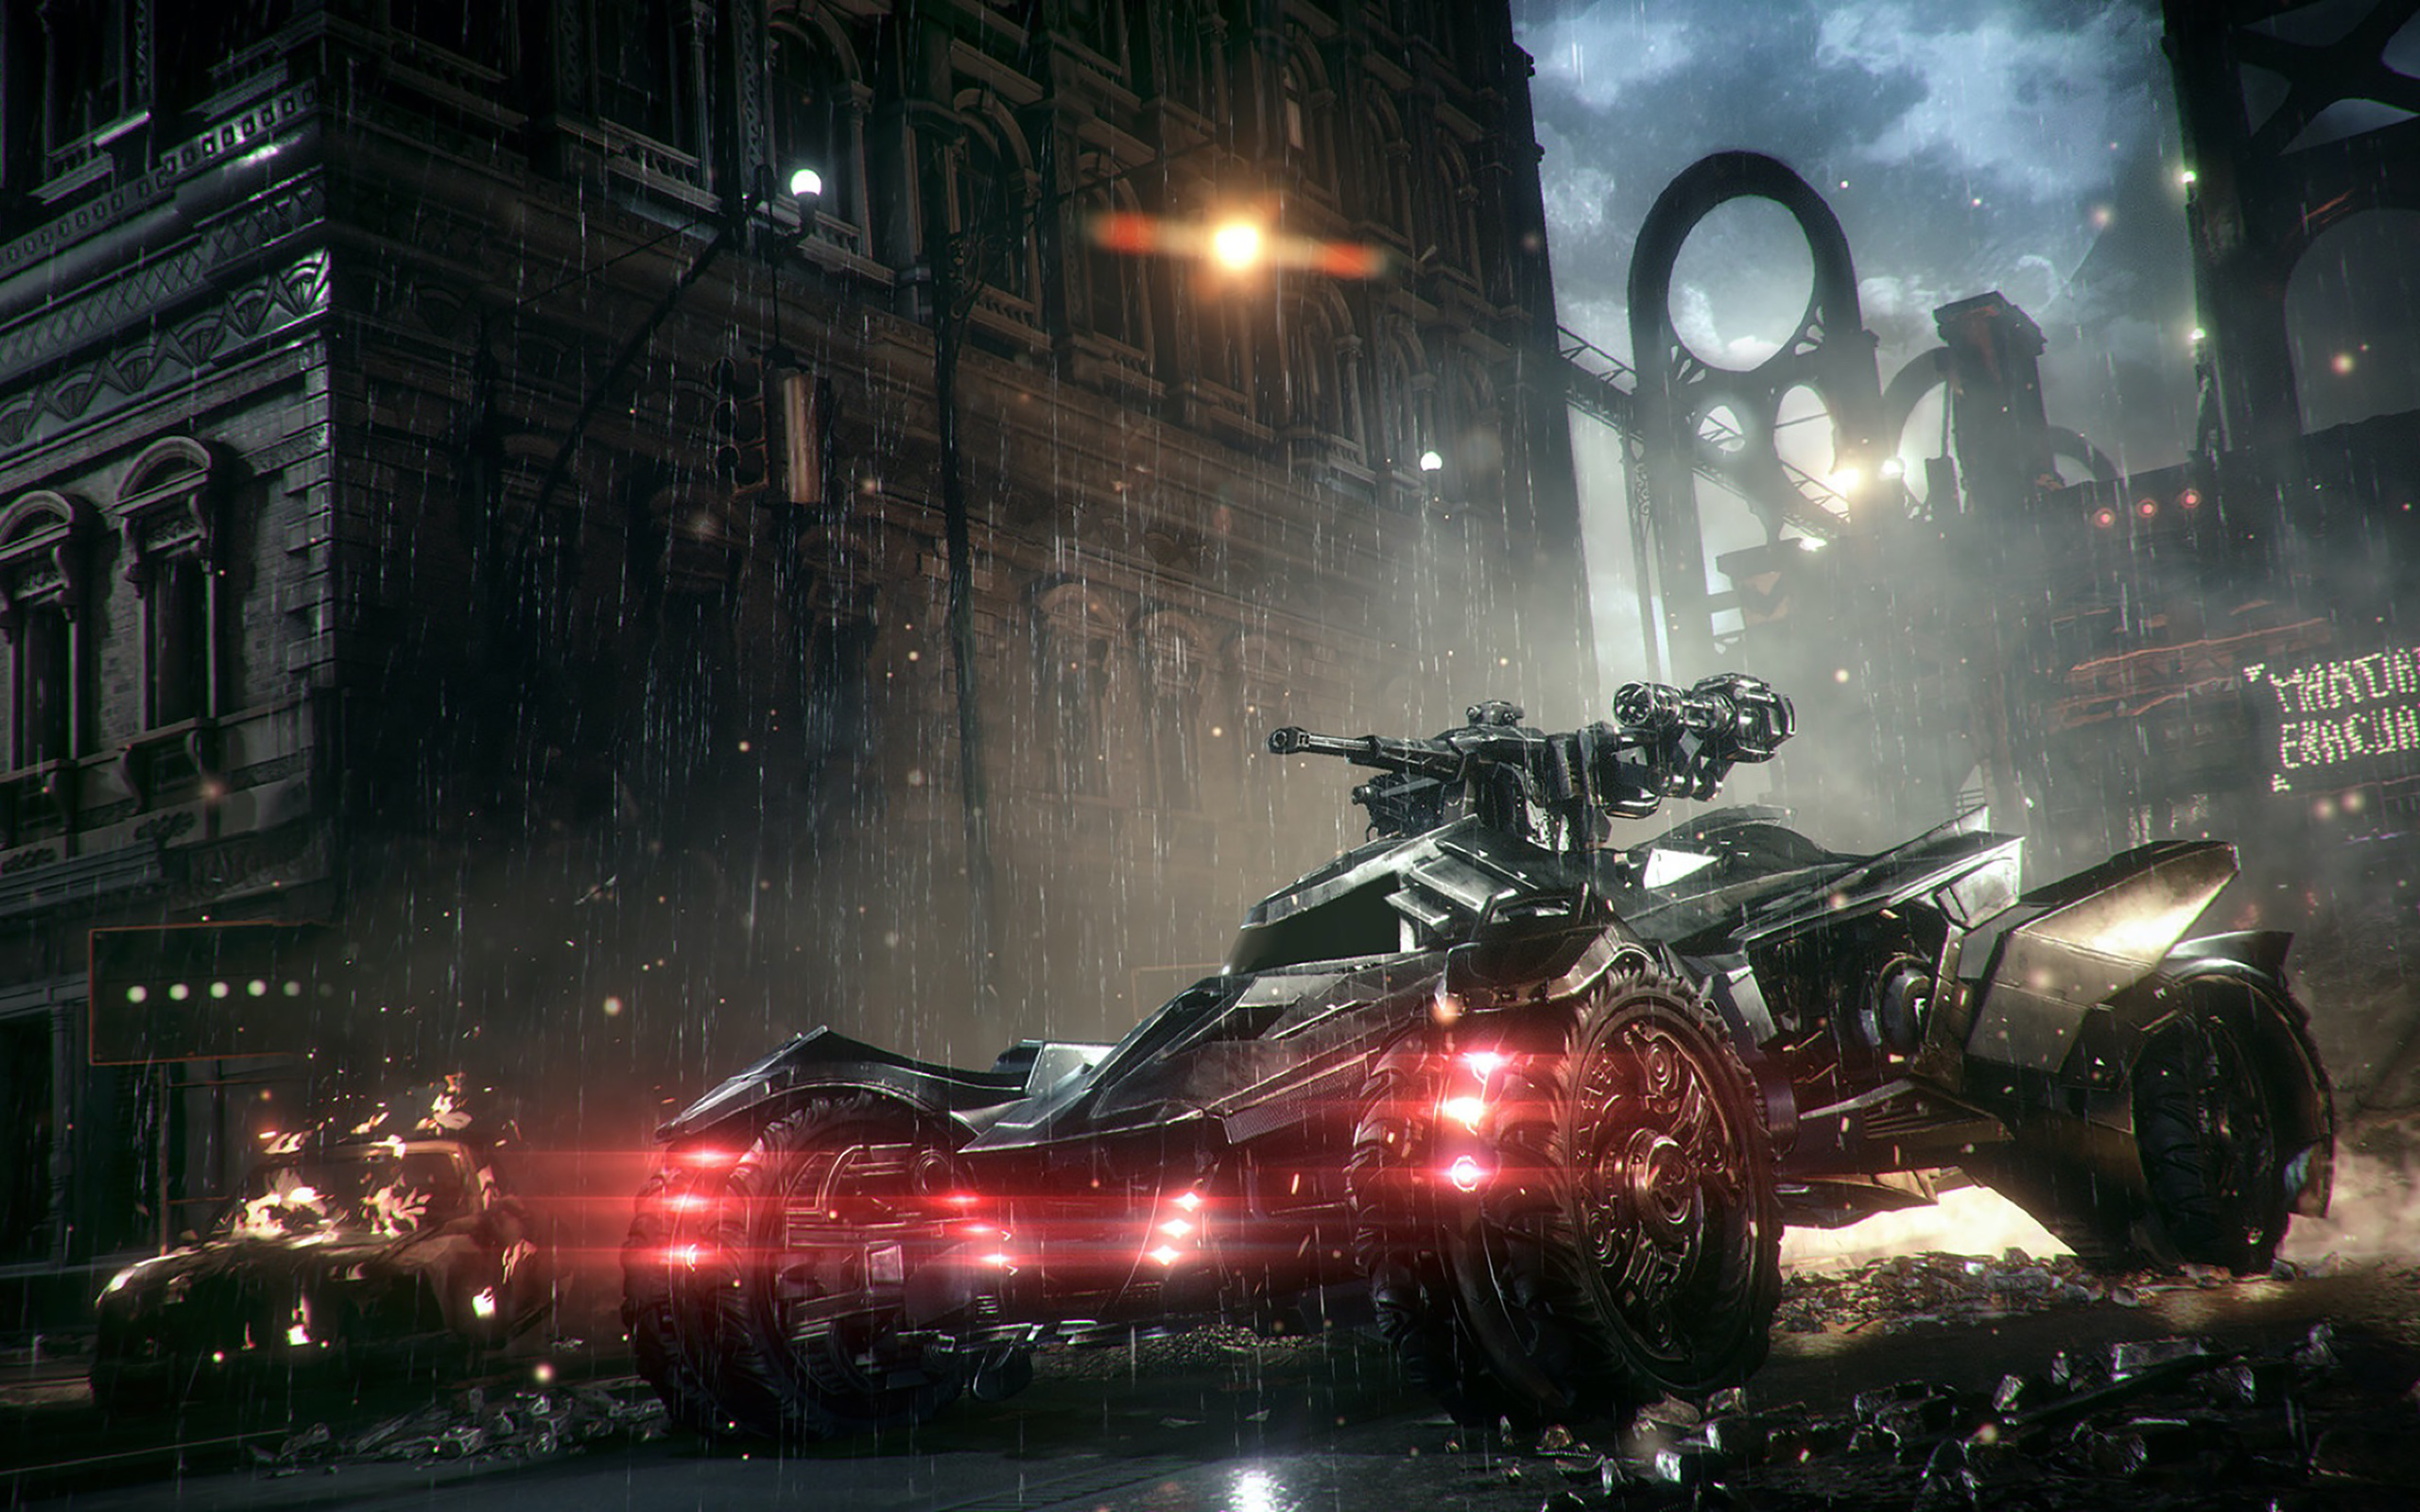 Das Batmobil im Kampfmodus.